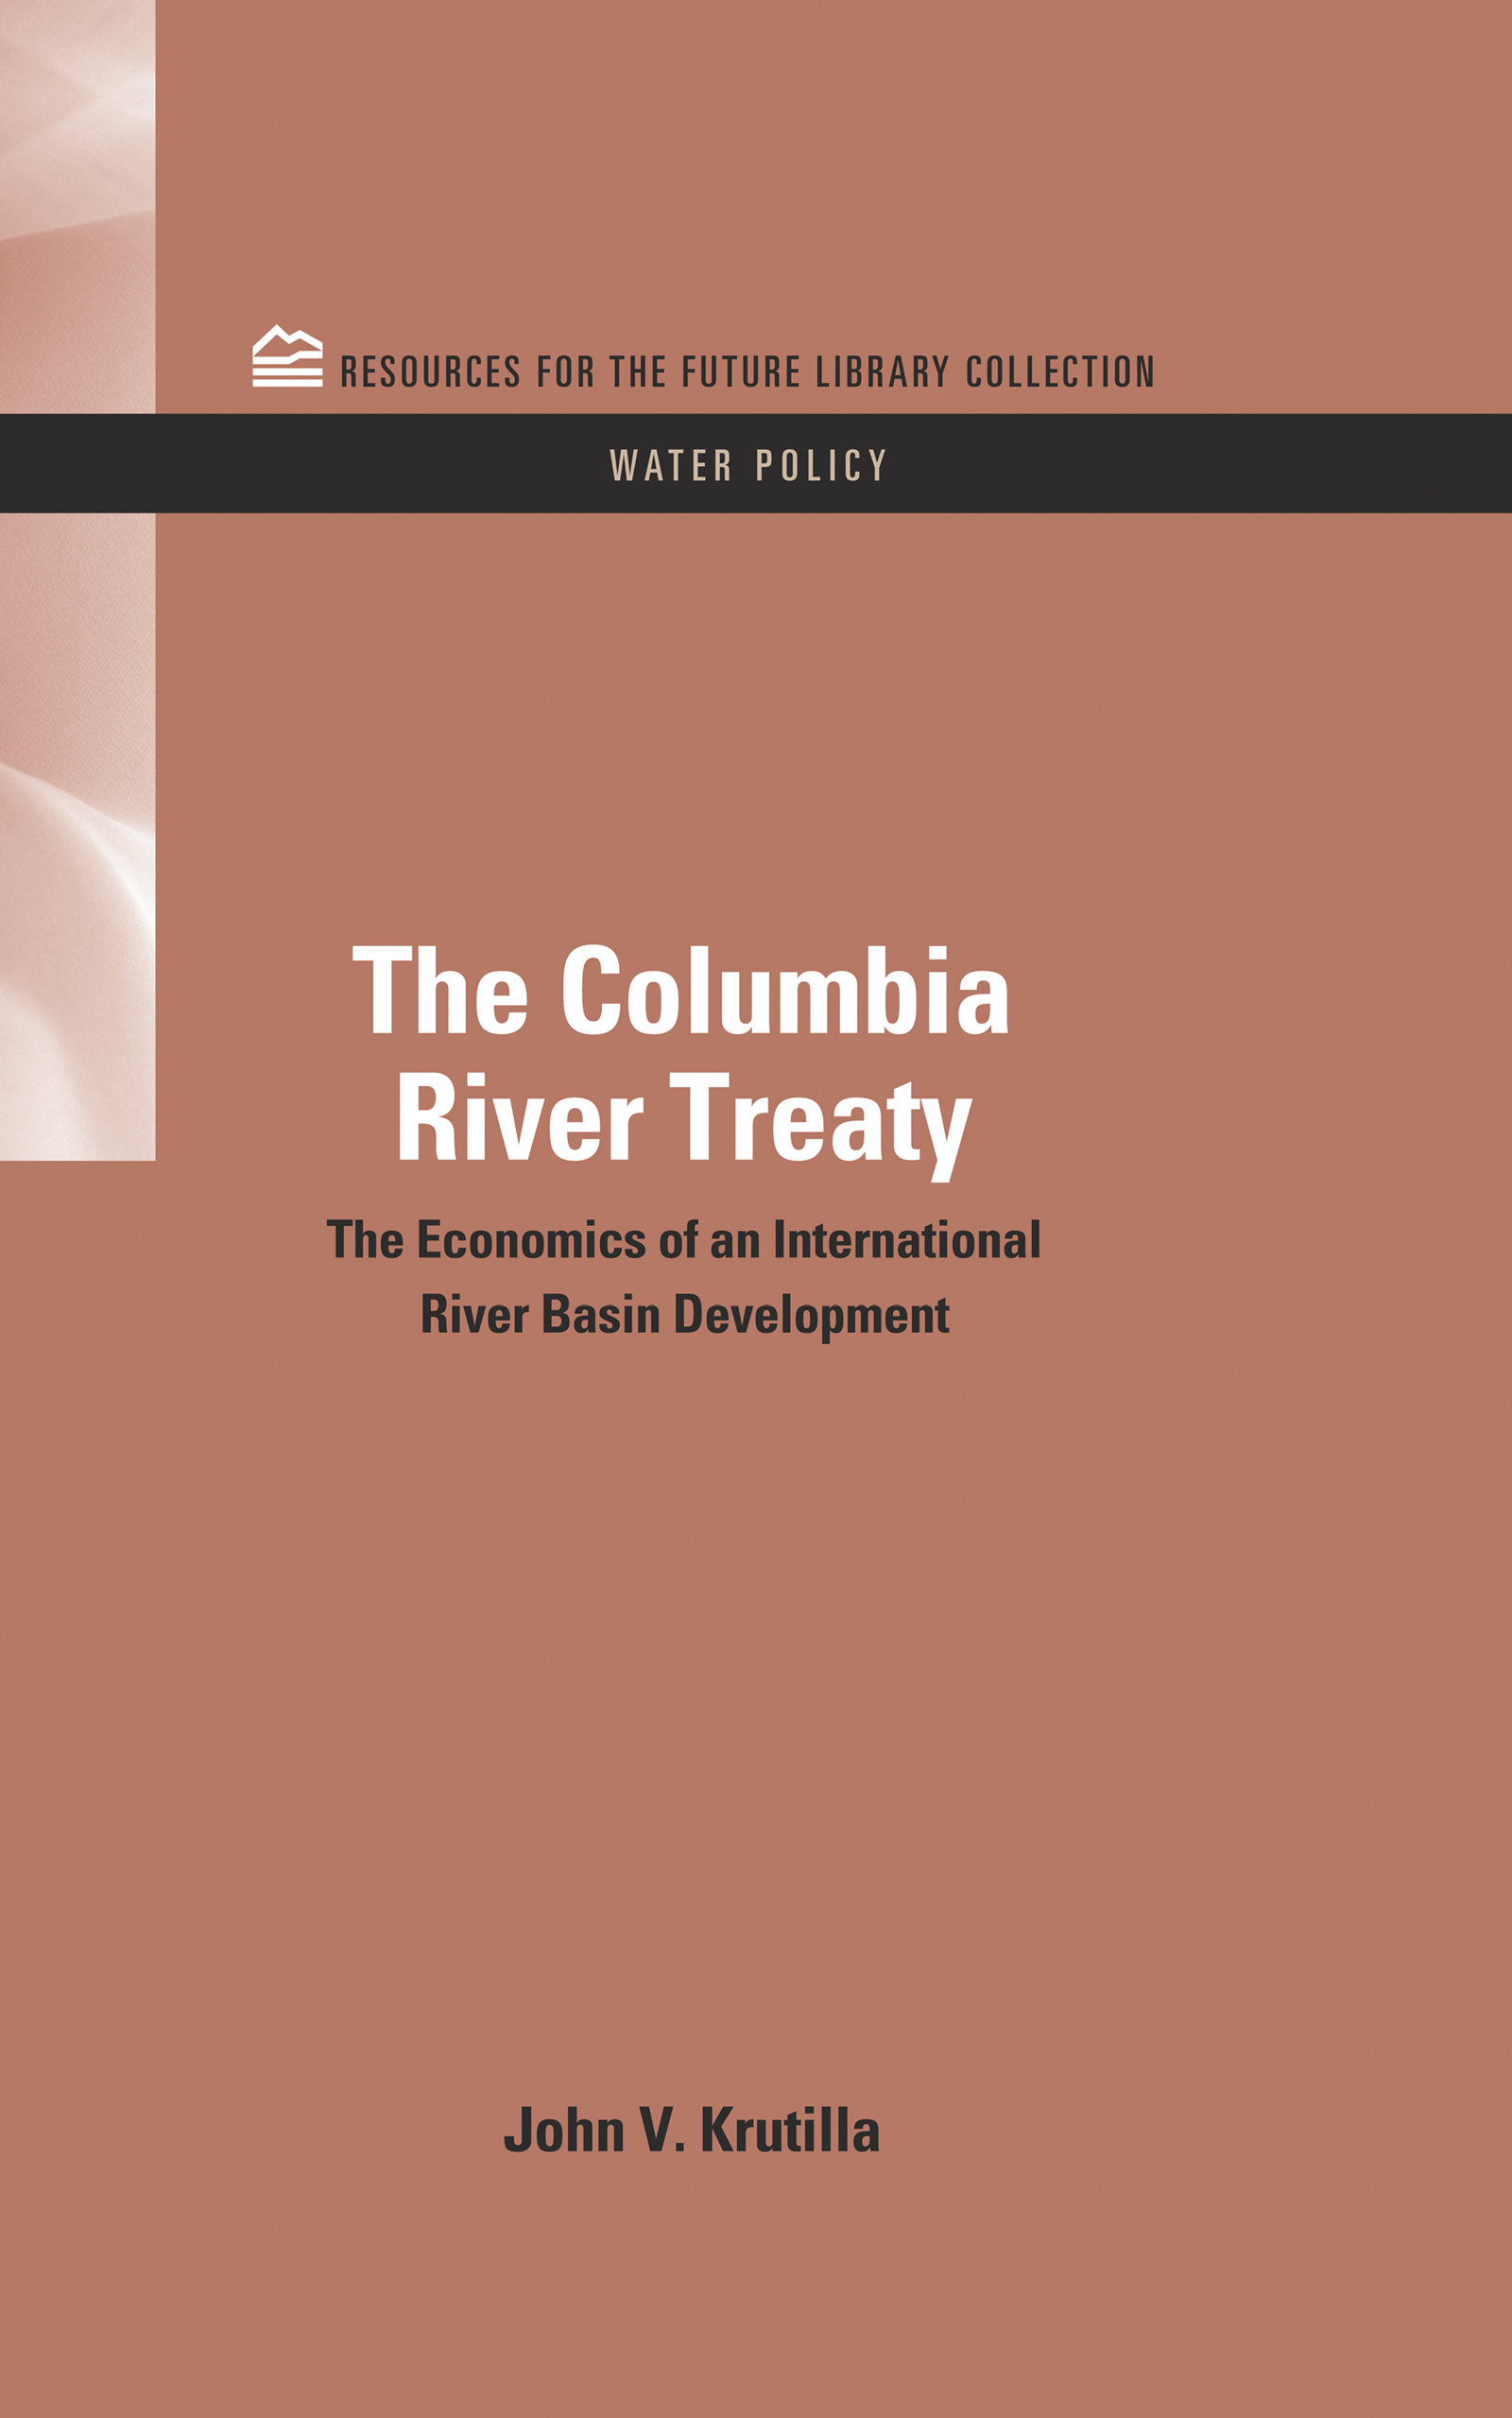 The Columbia River Treaty: The Economics of an International River Basin Development book cover